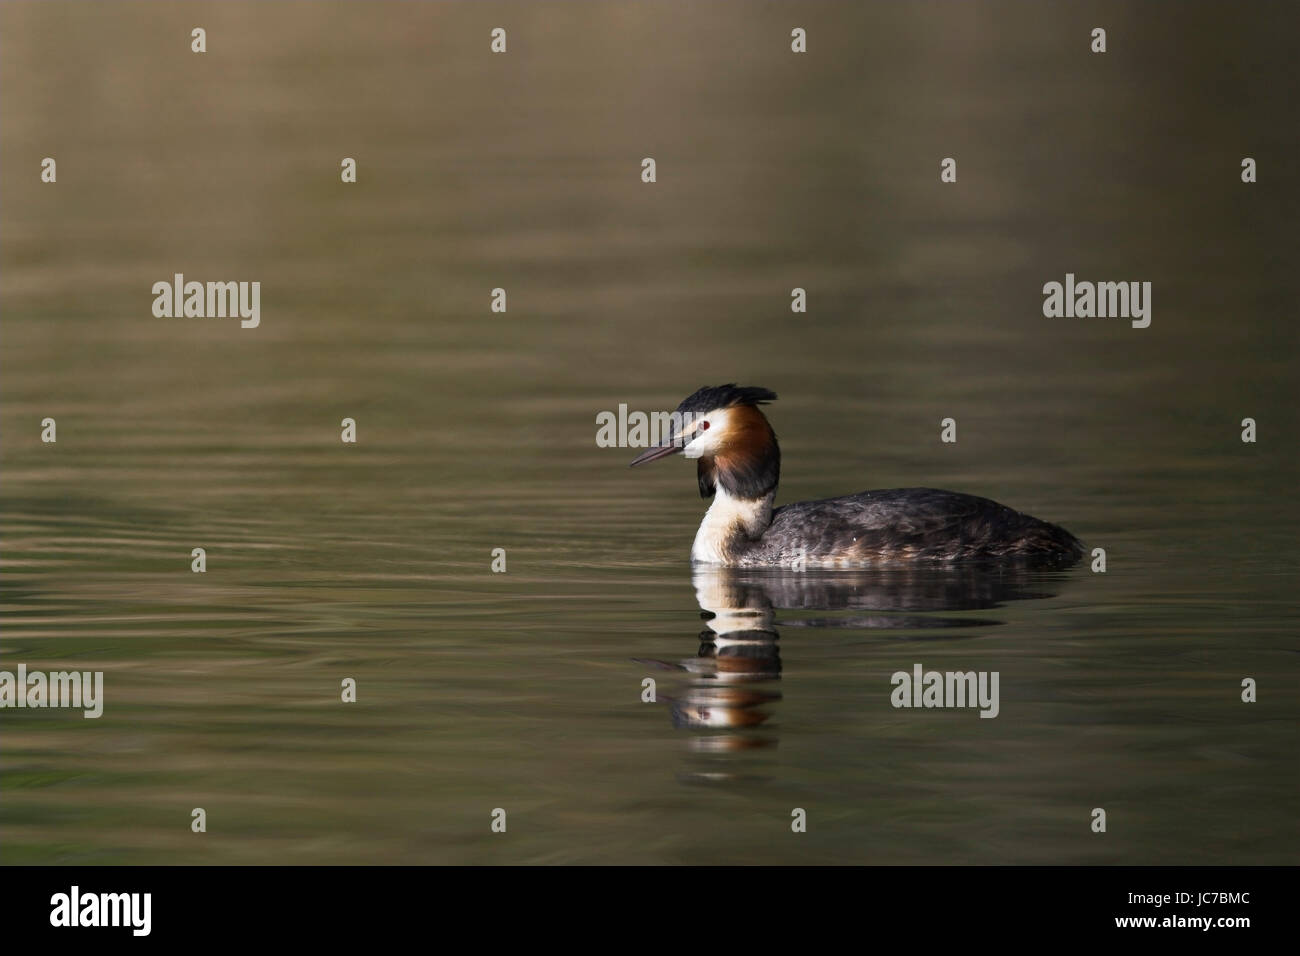 Bonnet diver, Great Crested Grebe, Podiceps cristatus, Haubentaucher / Great Crested Grebe / Podiceps cristatus - Stock Image